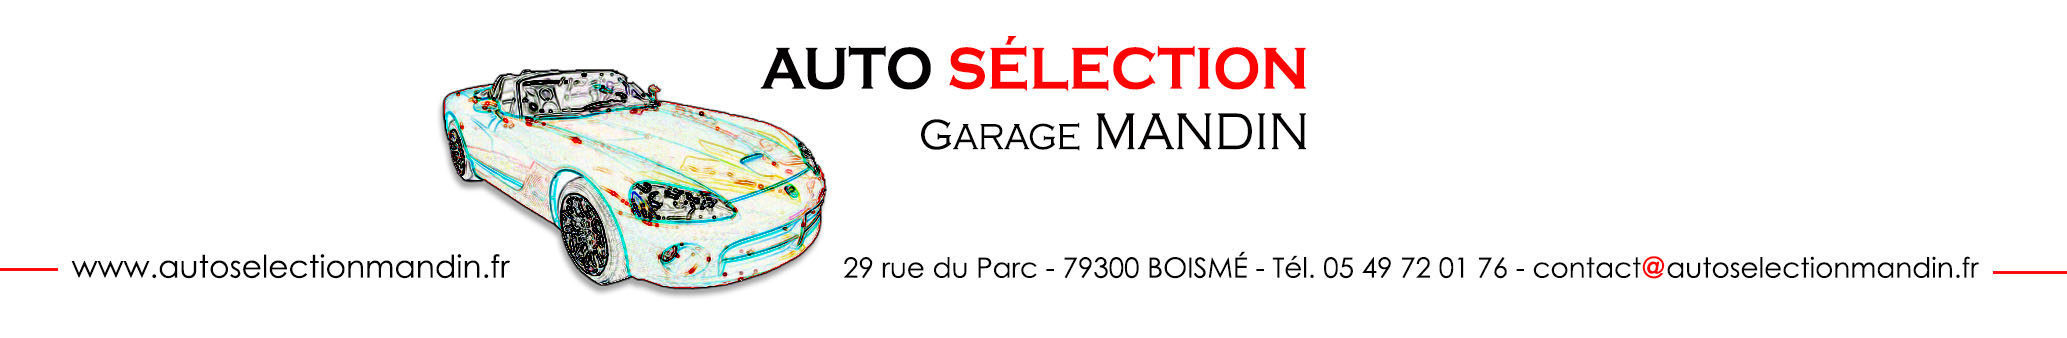 AUTO SELECTION GARAGE MANDIN